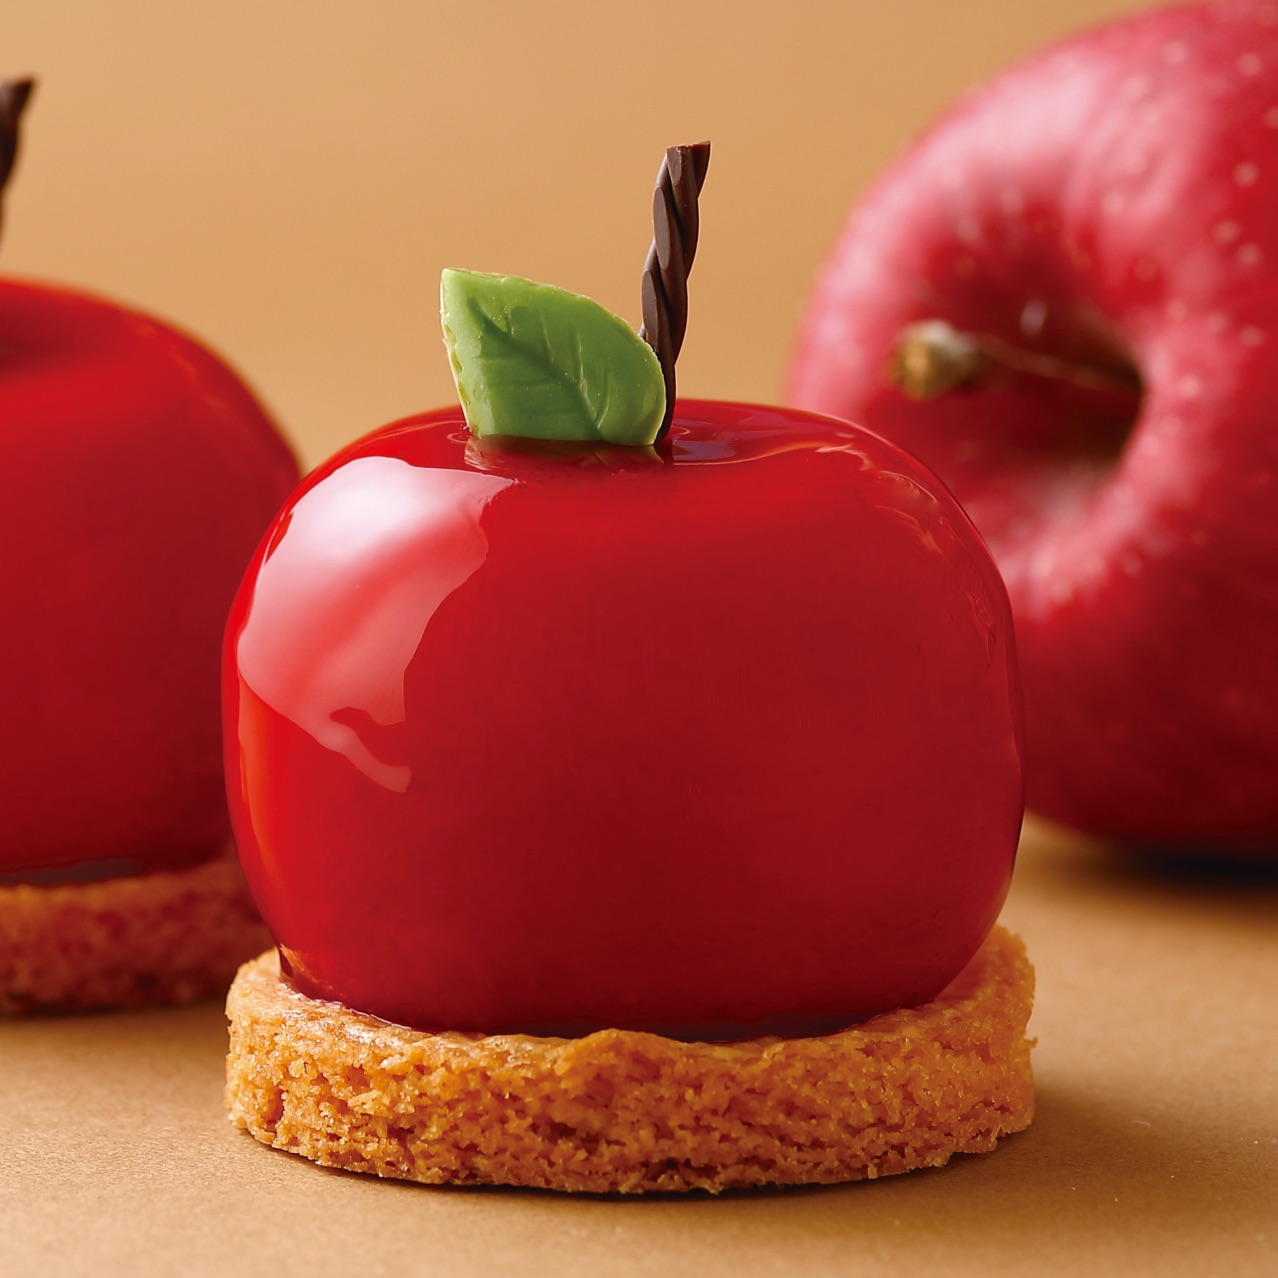 %e6%b8%8b%e8%b0%b7%e3%82%b9%e3%82%af%e3%83%a9%e3%83%b3%e3%83%96%e3%83%ab%e3%82%b9%e3%82%af%e3%82%a8%e3%82%a2-shibuya-scramble-square-autumn-fruity-desserts-%e7%94%9c%e9%bb%9e-2